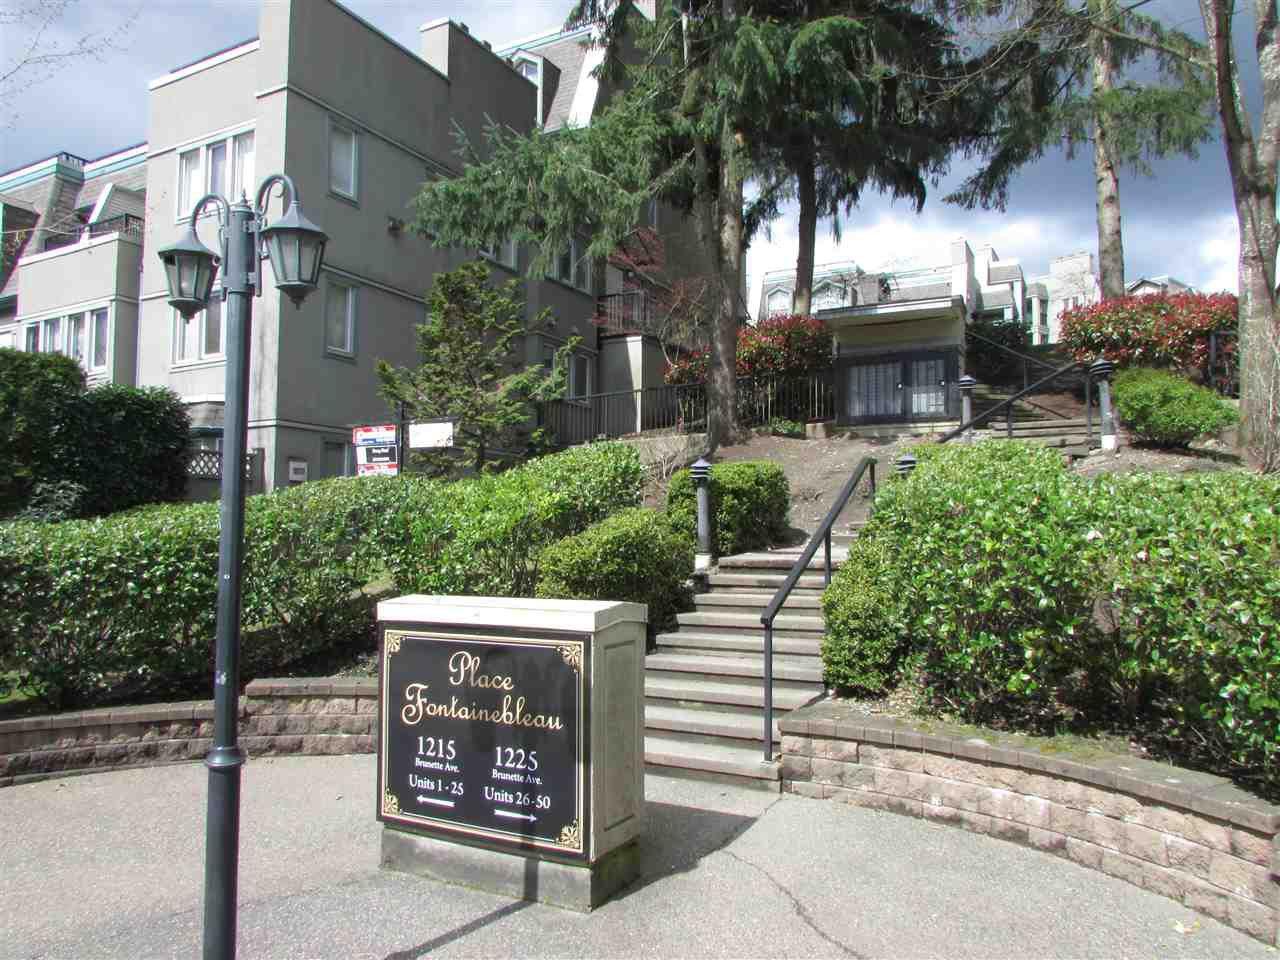 Main Photo: 13 1215 BRUNETTE Avenue in Coquitlam: Maillardville Townhouse for sale : MLS®# R2258520